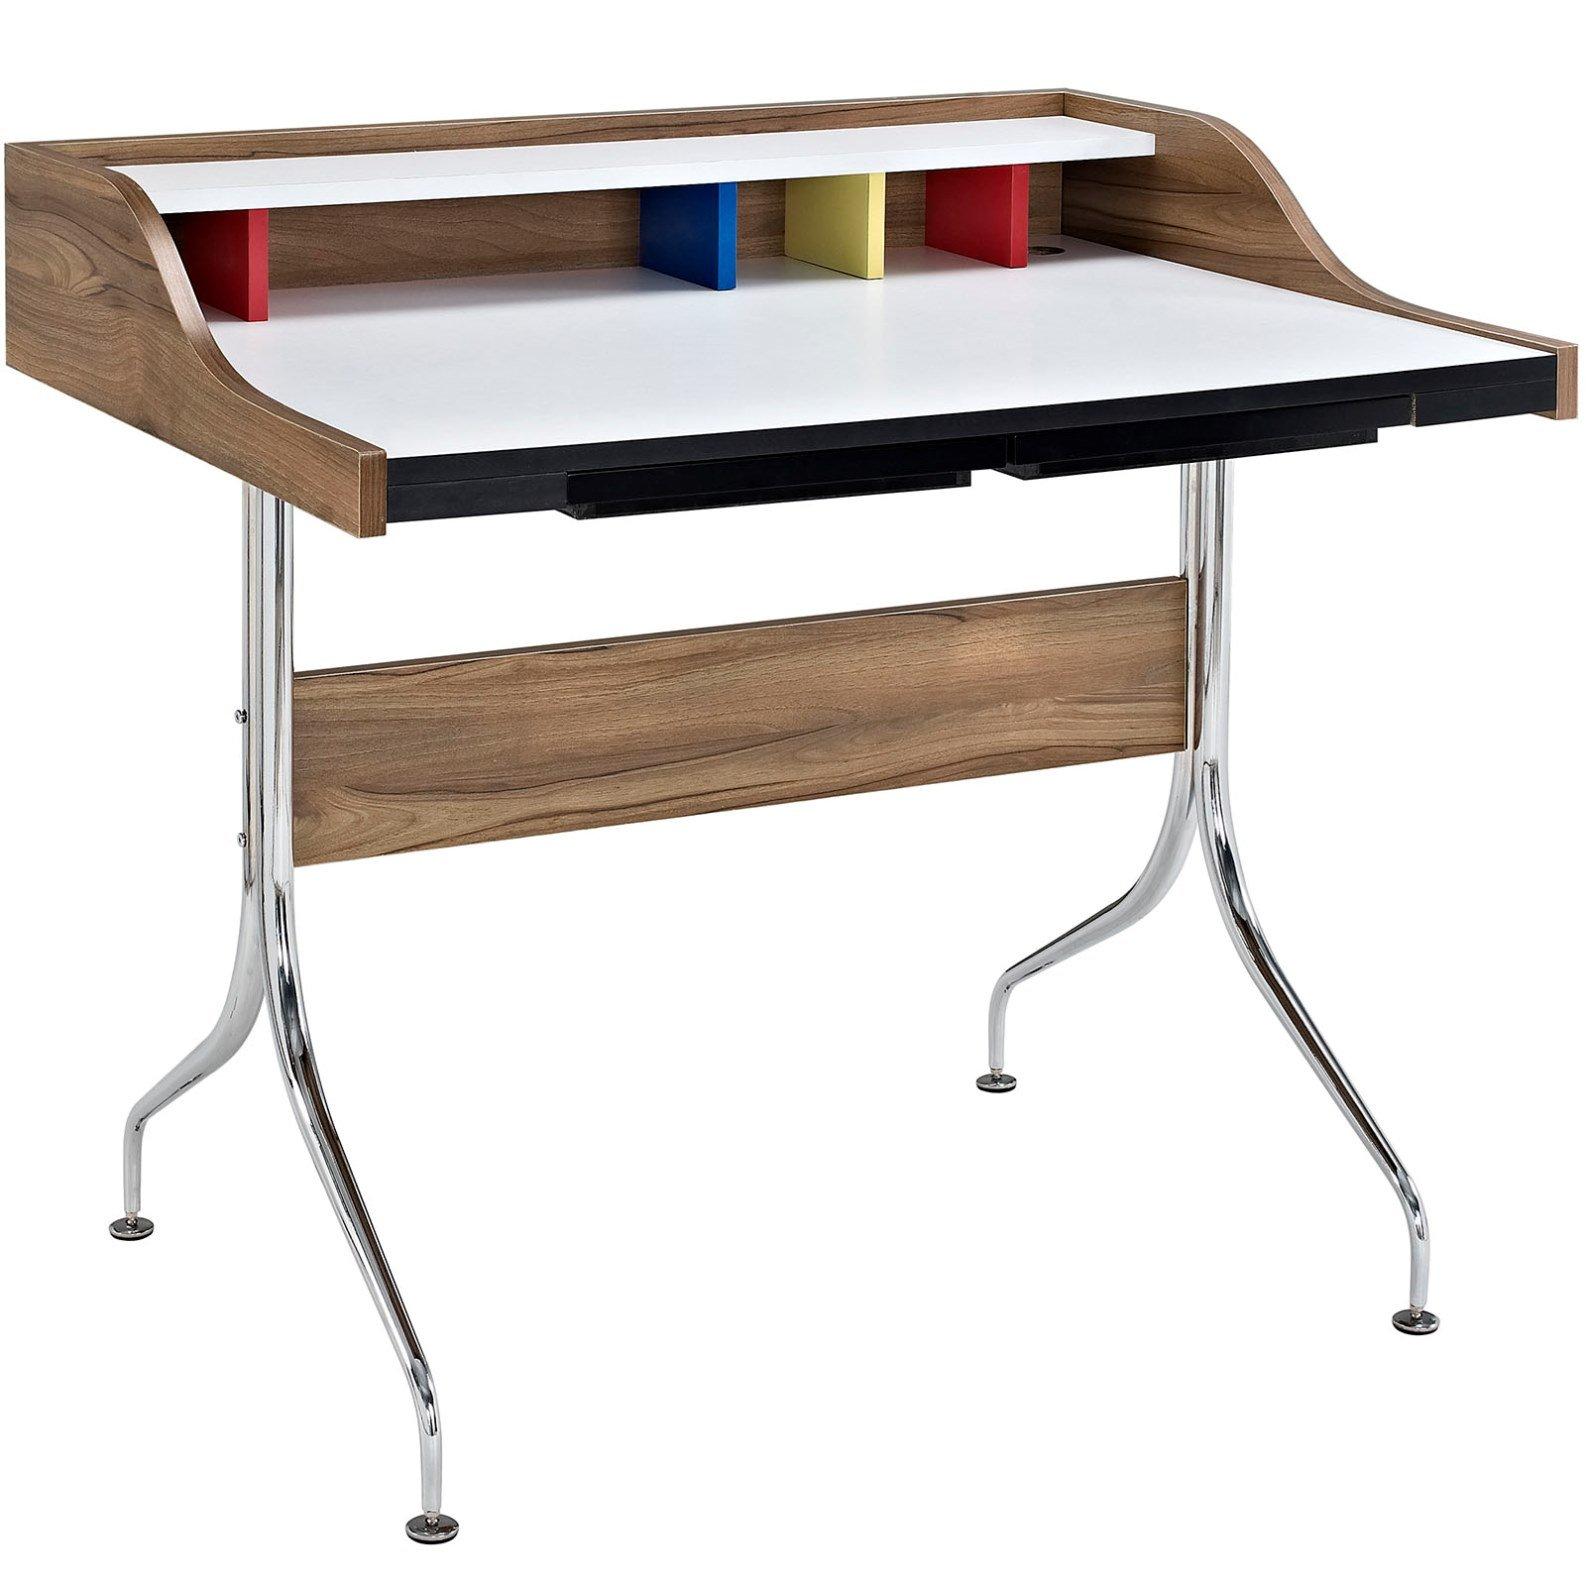 Modern Contemporary Urban Design Work Home Office Desk, Brown, Wood